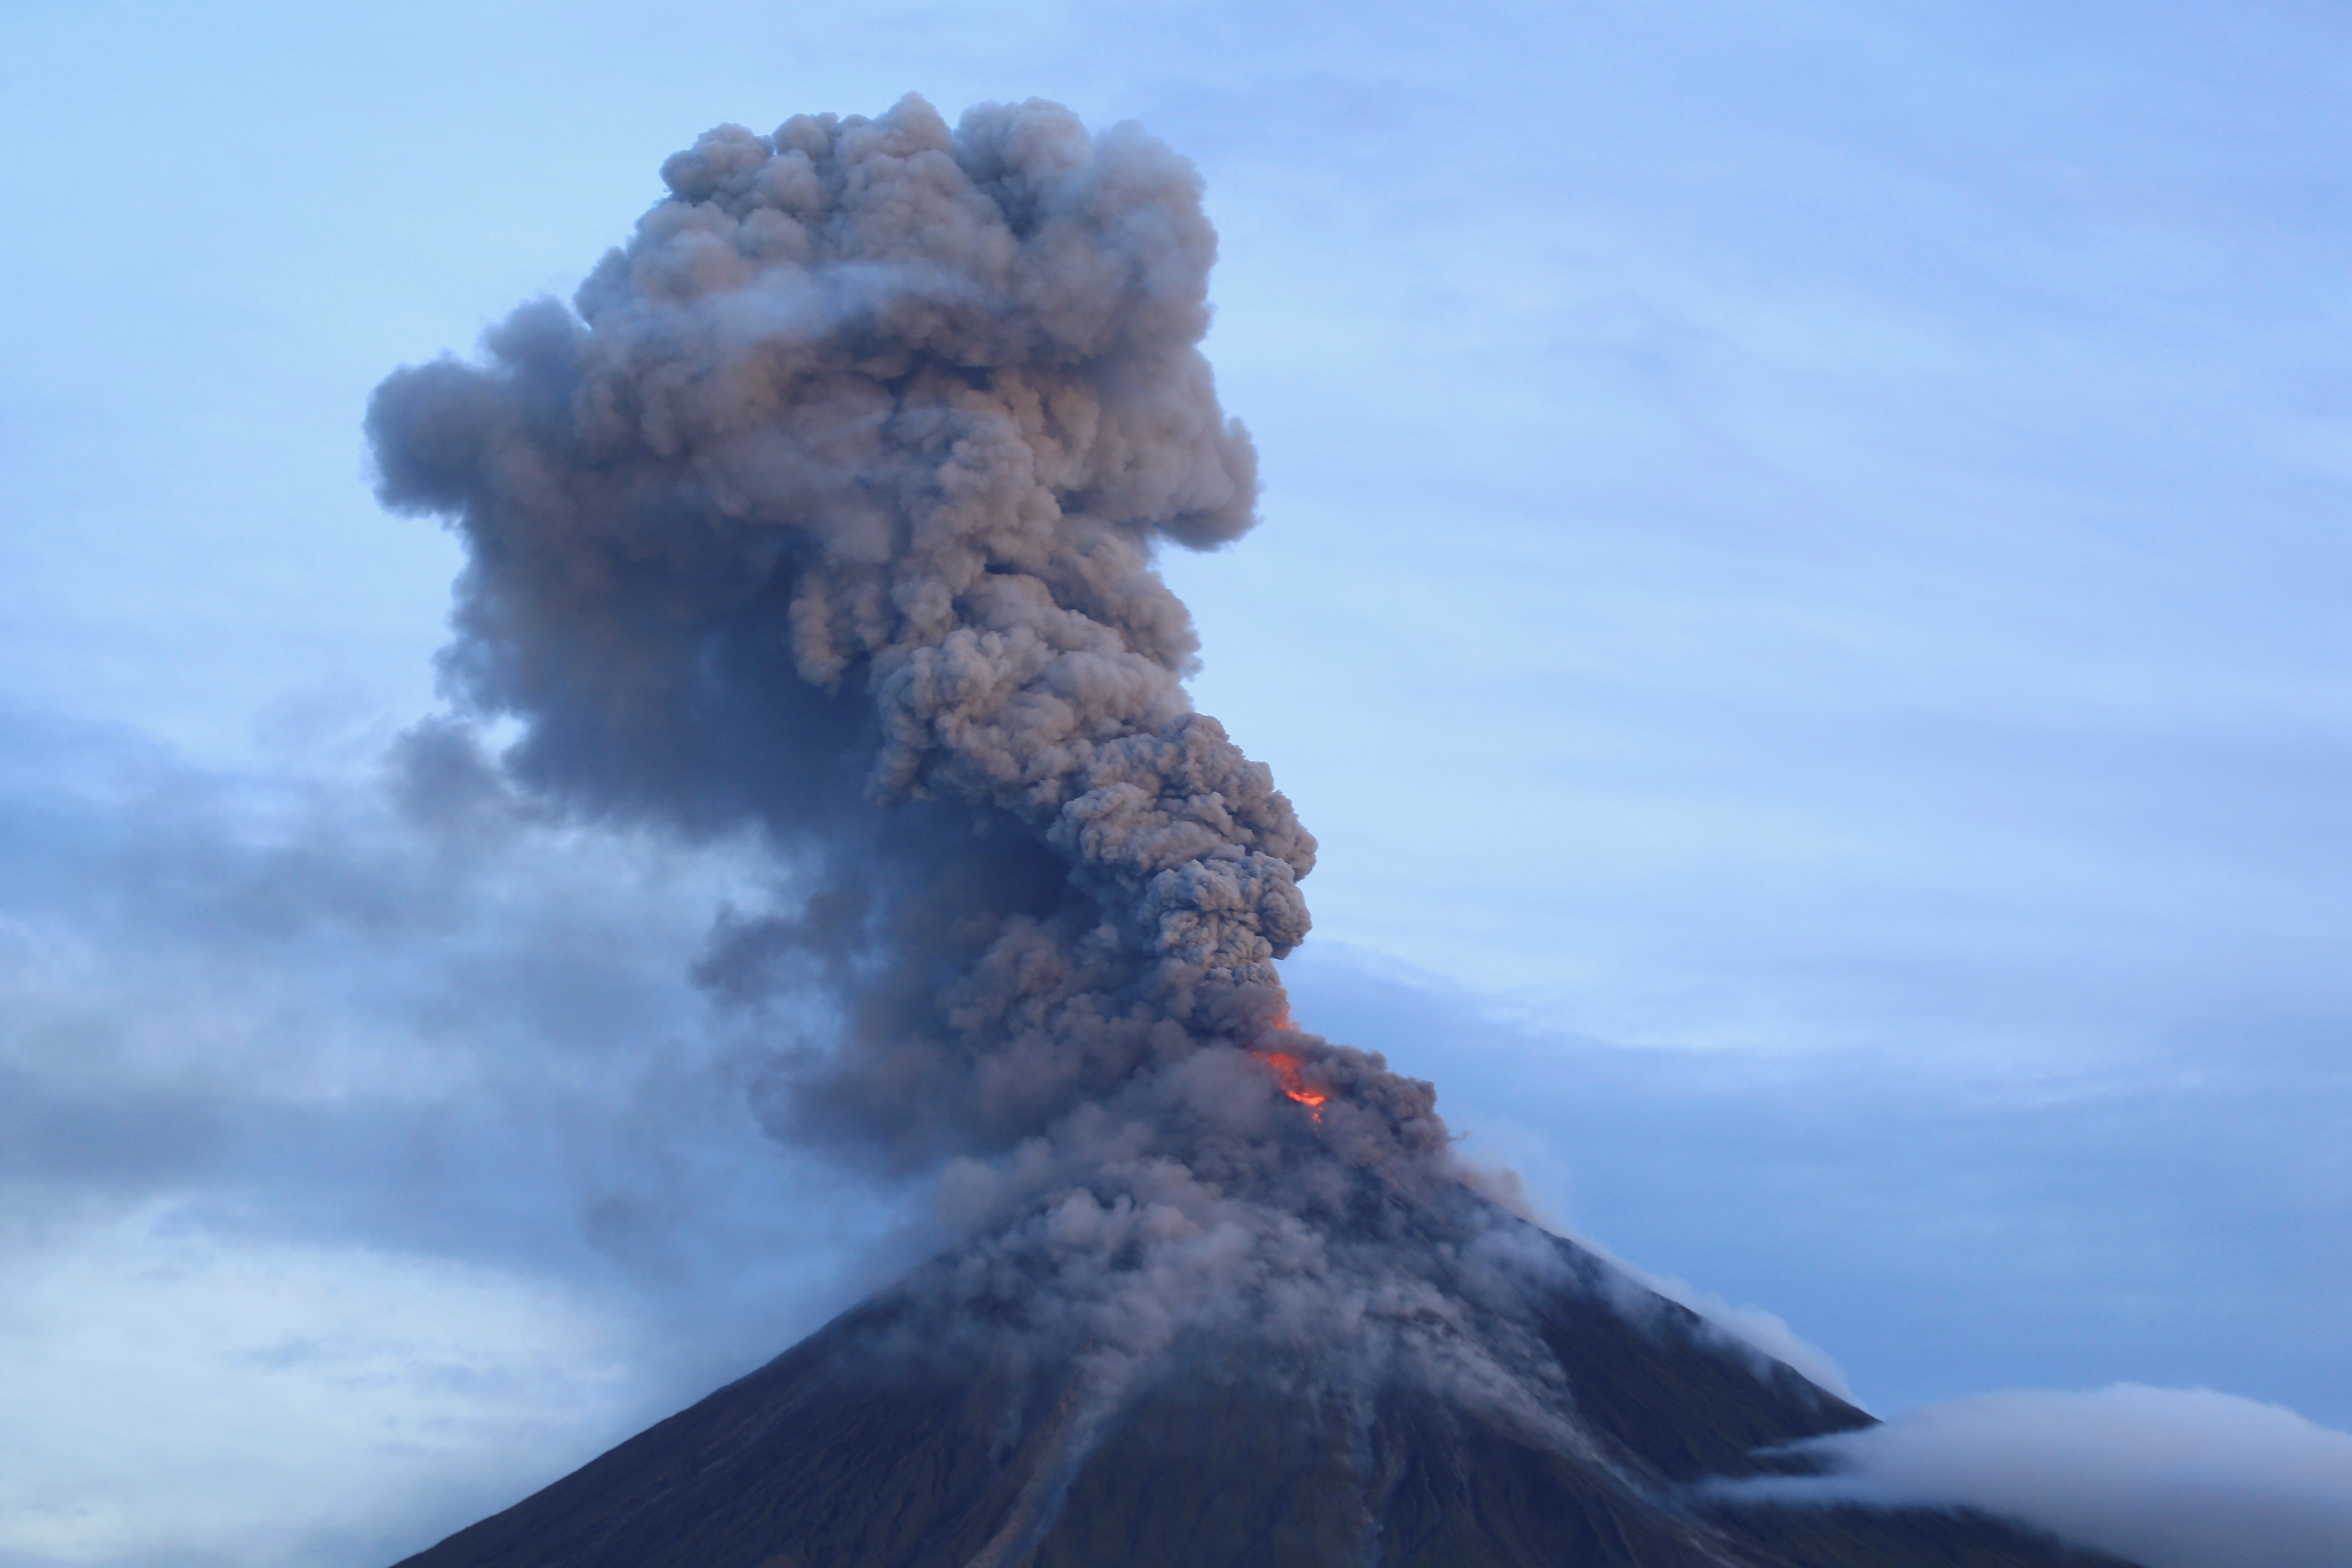 جانب من ثوران بركان مايون